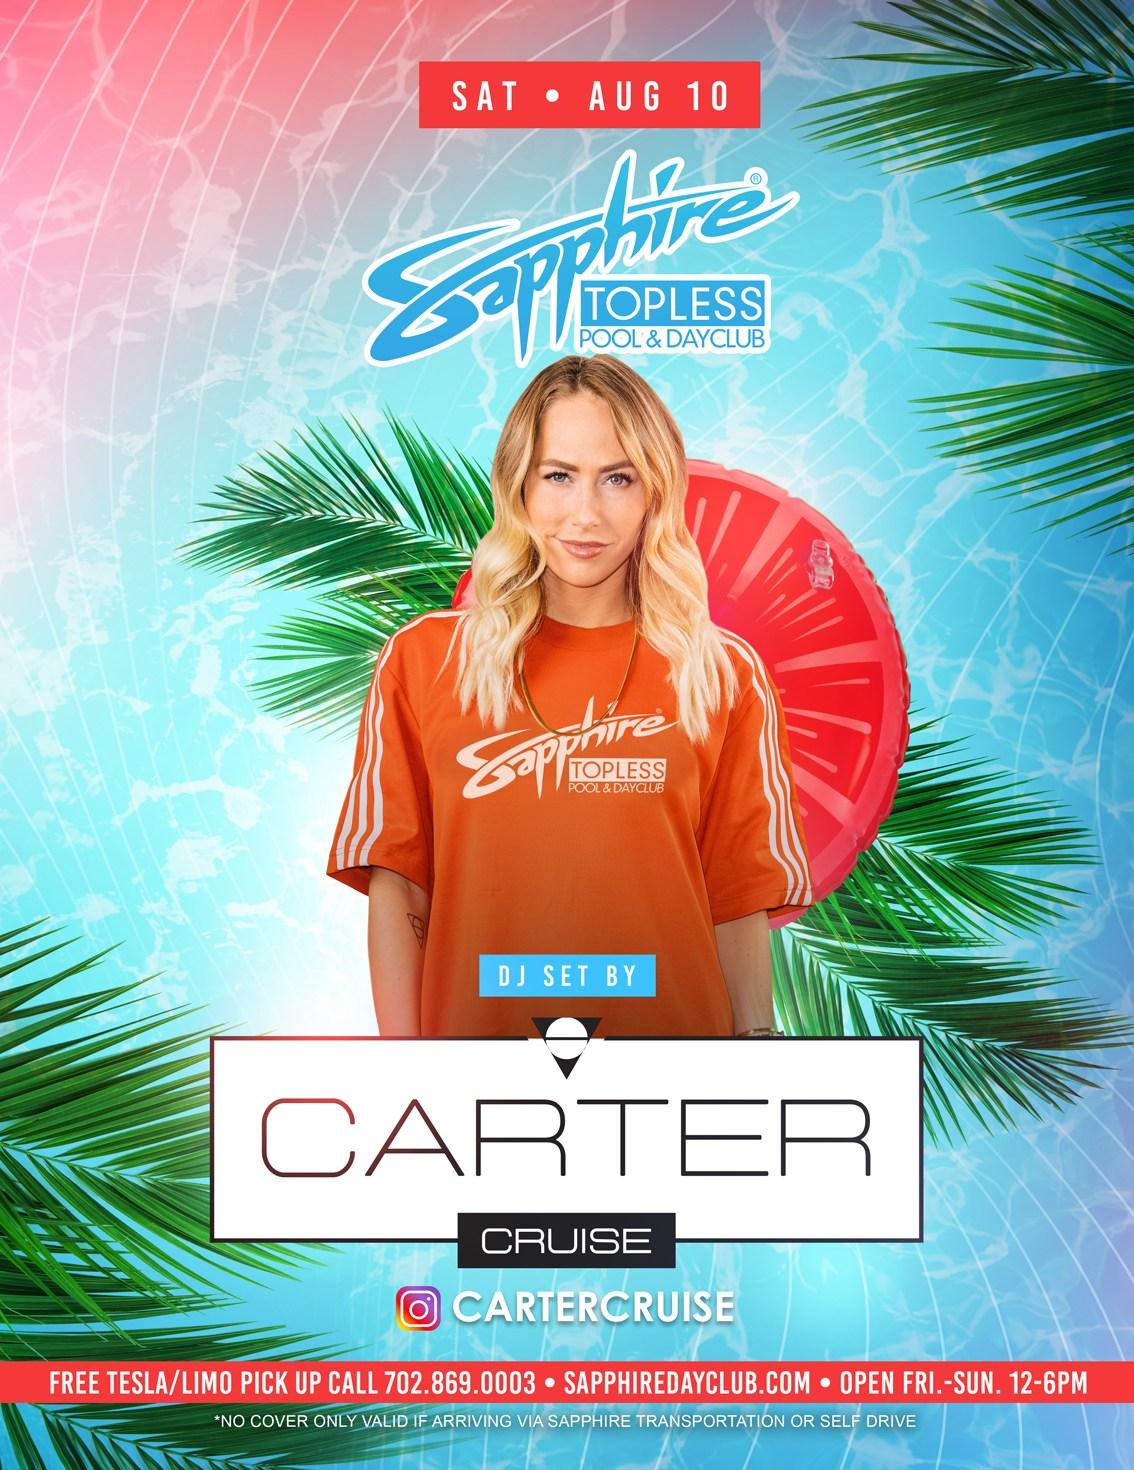 DJ Set by Carter Cruise